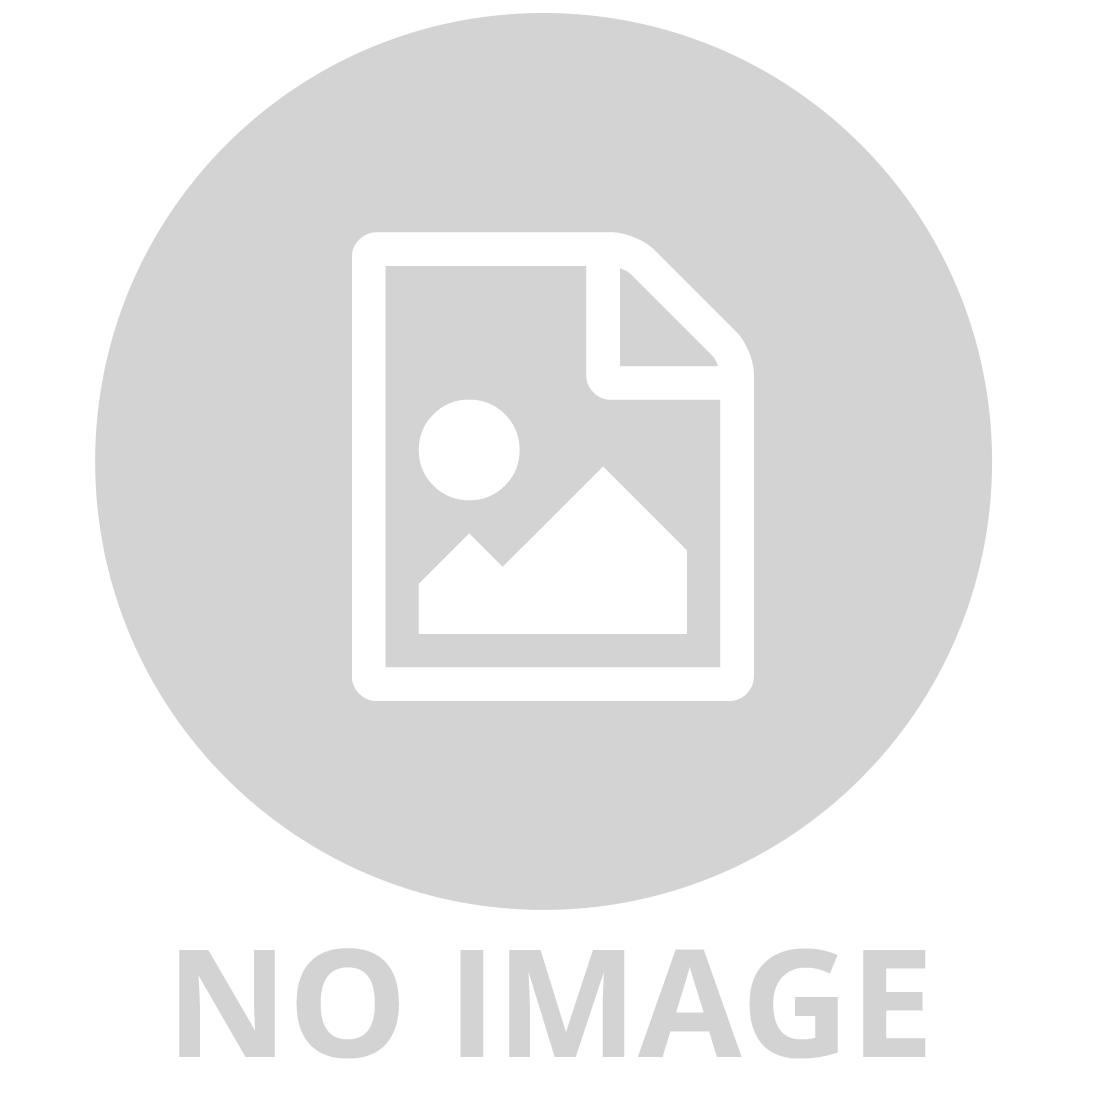 FROZEN 2 SFX & GLOW OLAF & ELSA